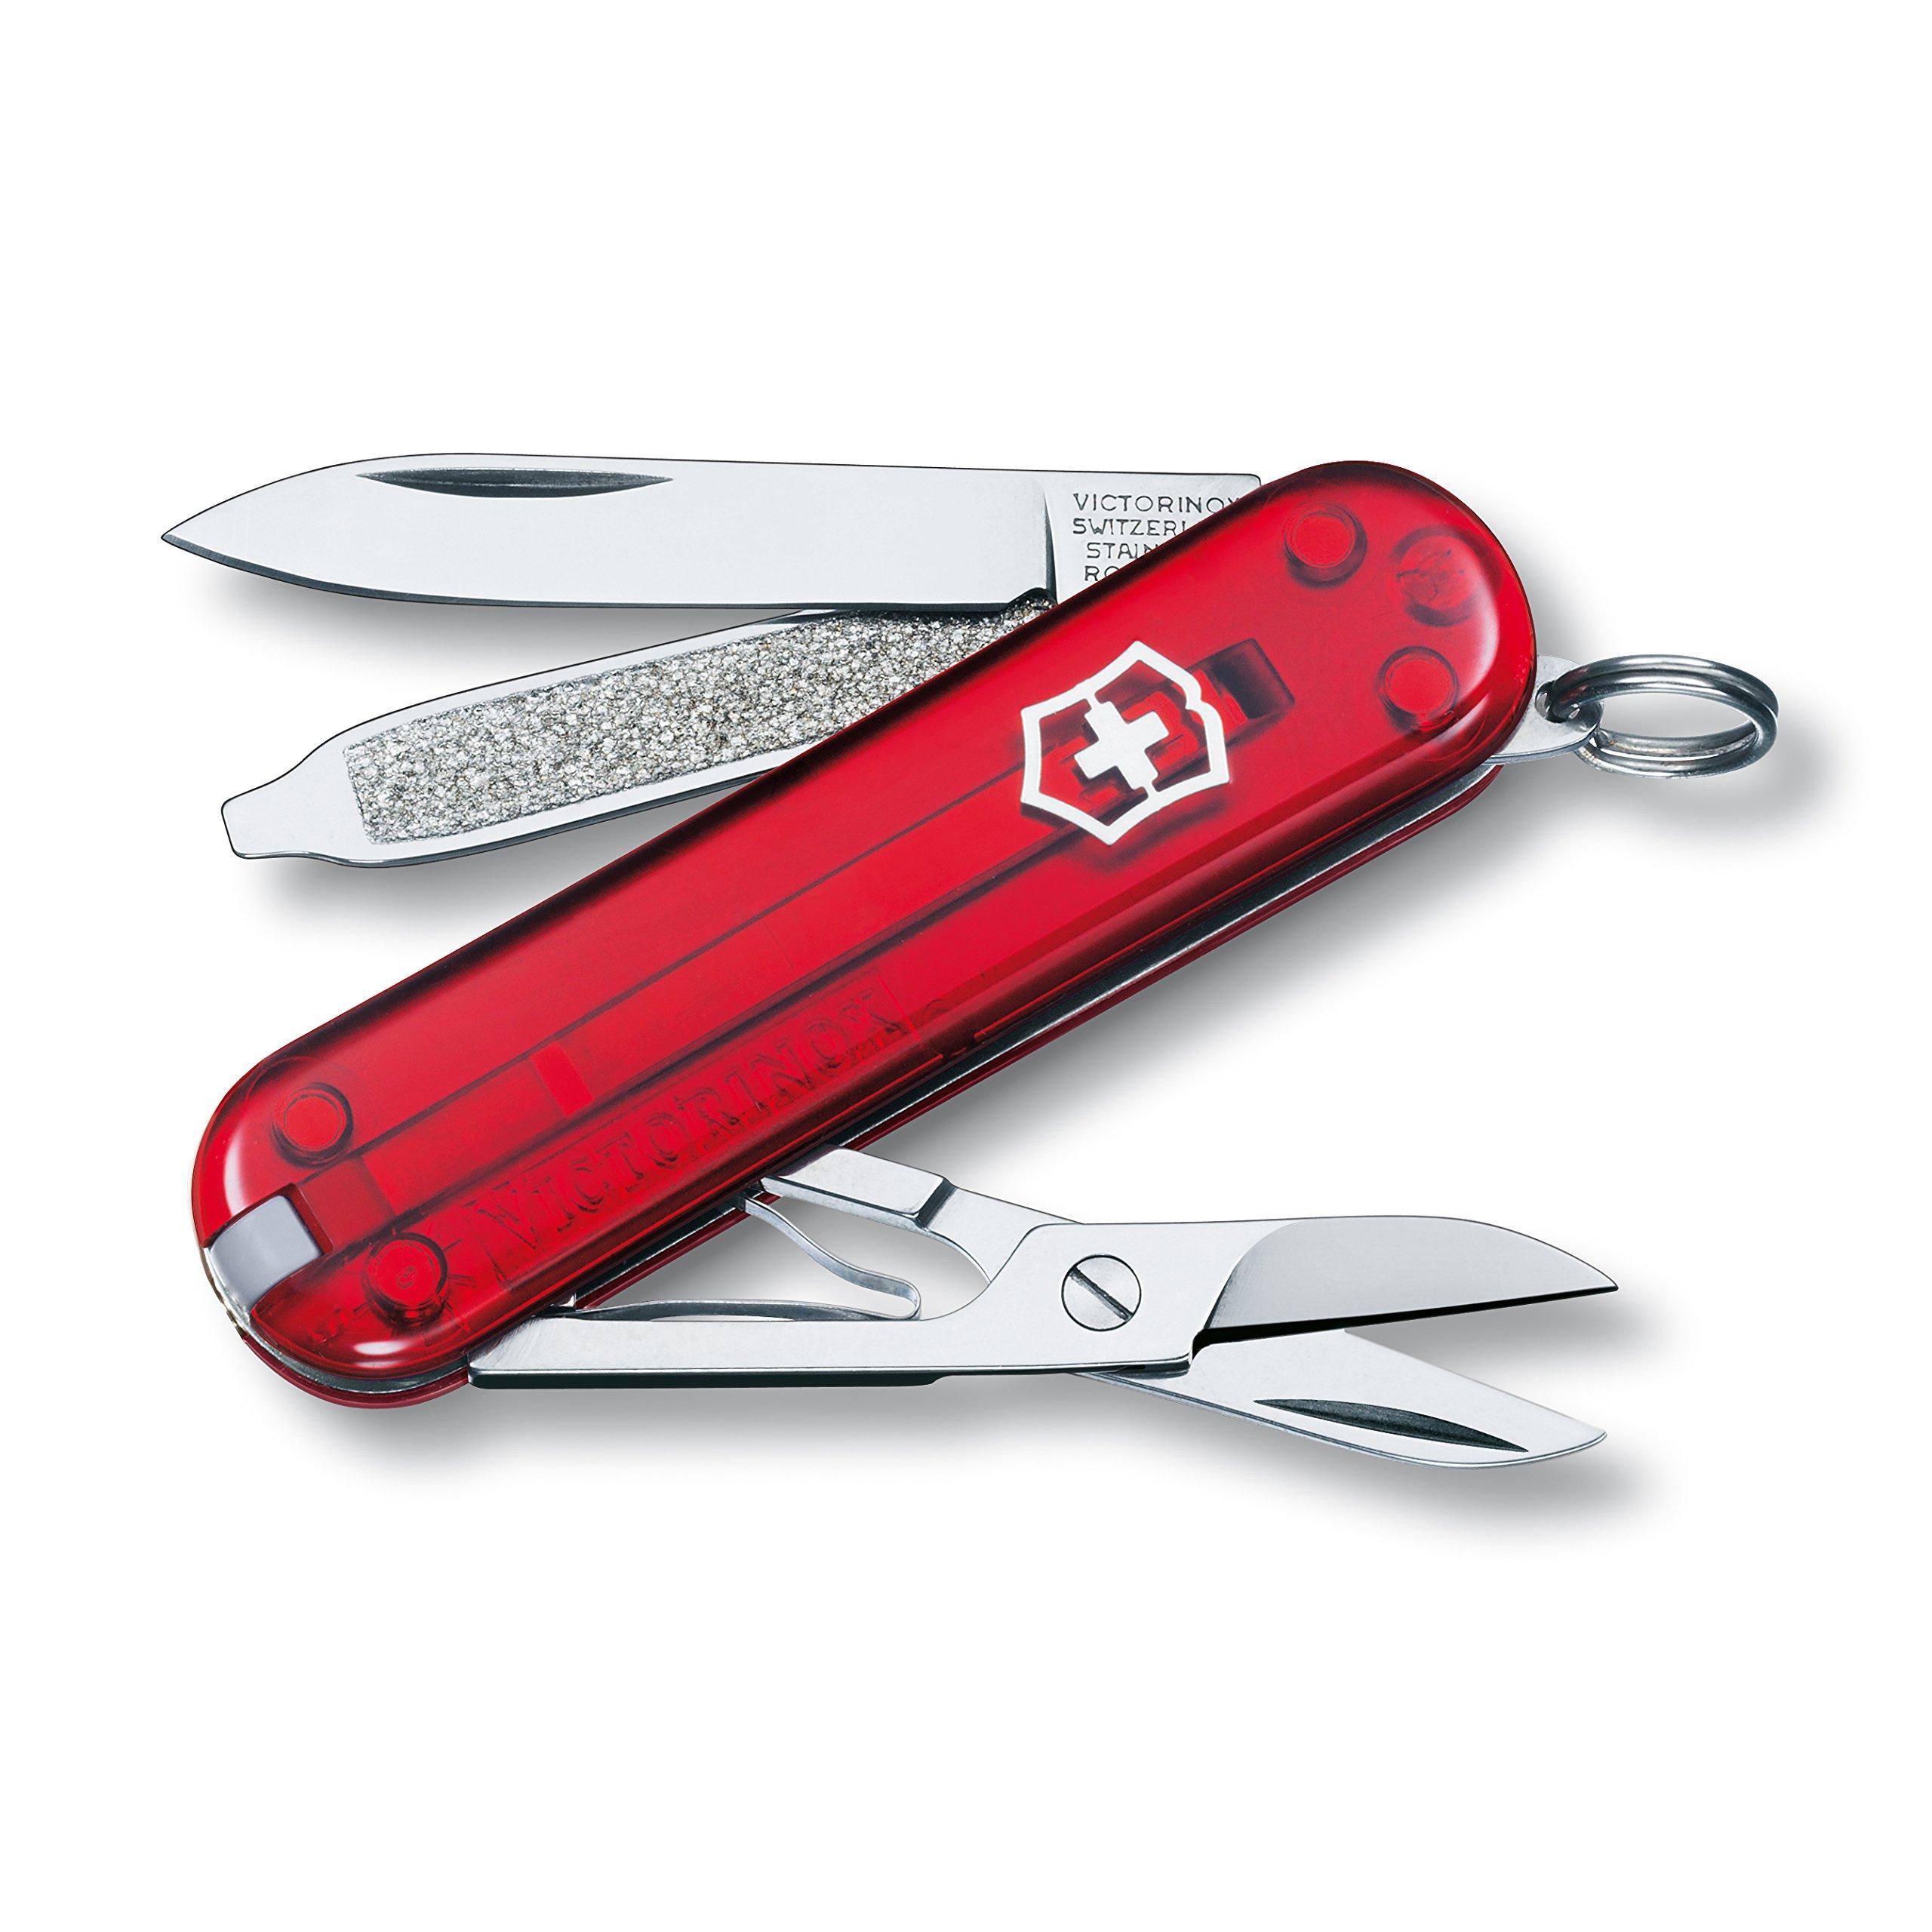 Victorinox Swiss Army Classic SD Pocket Knife, Translucent Ruby by Victorinox